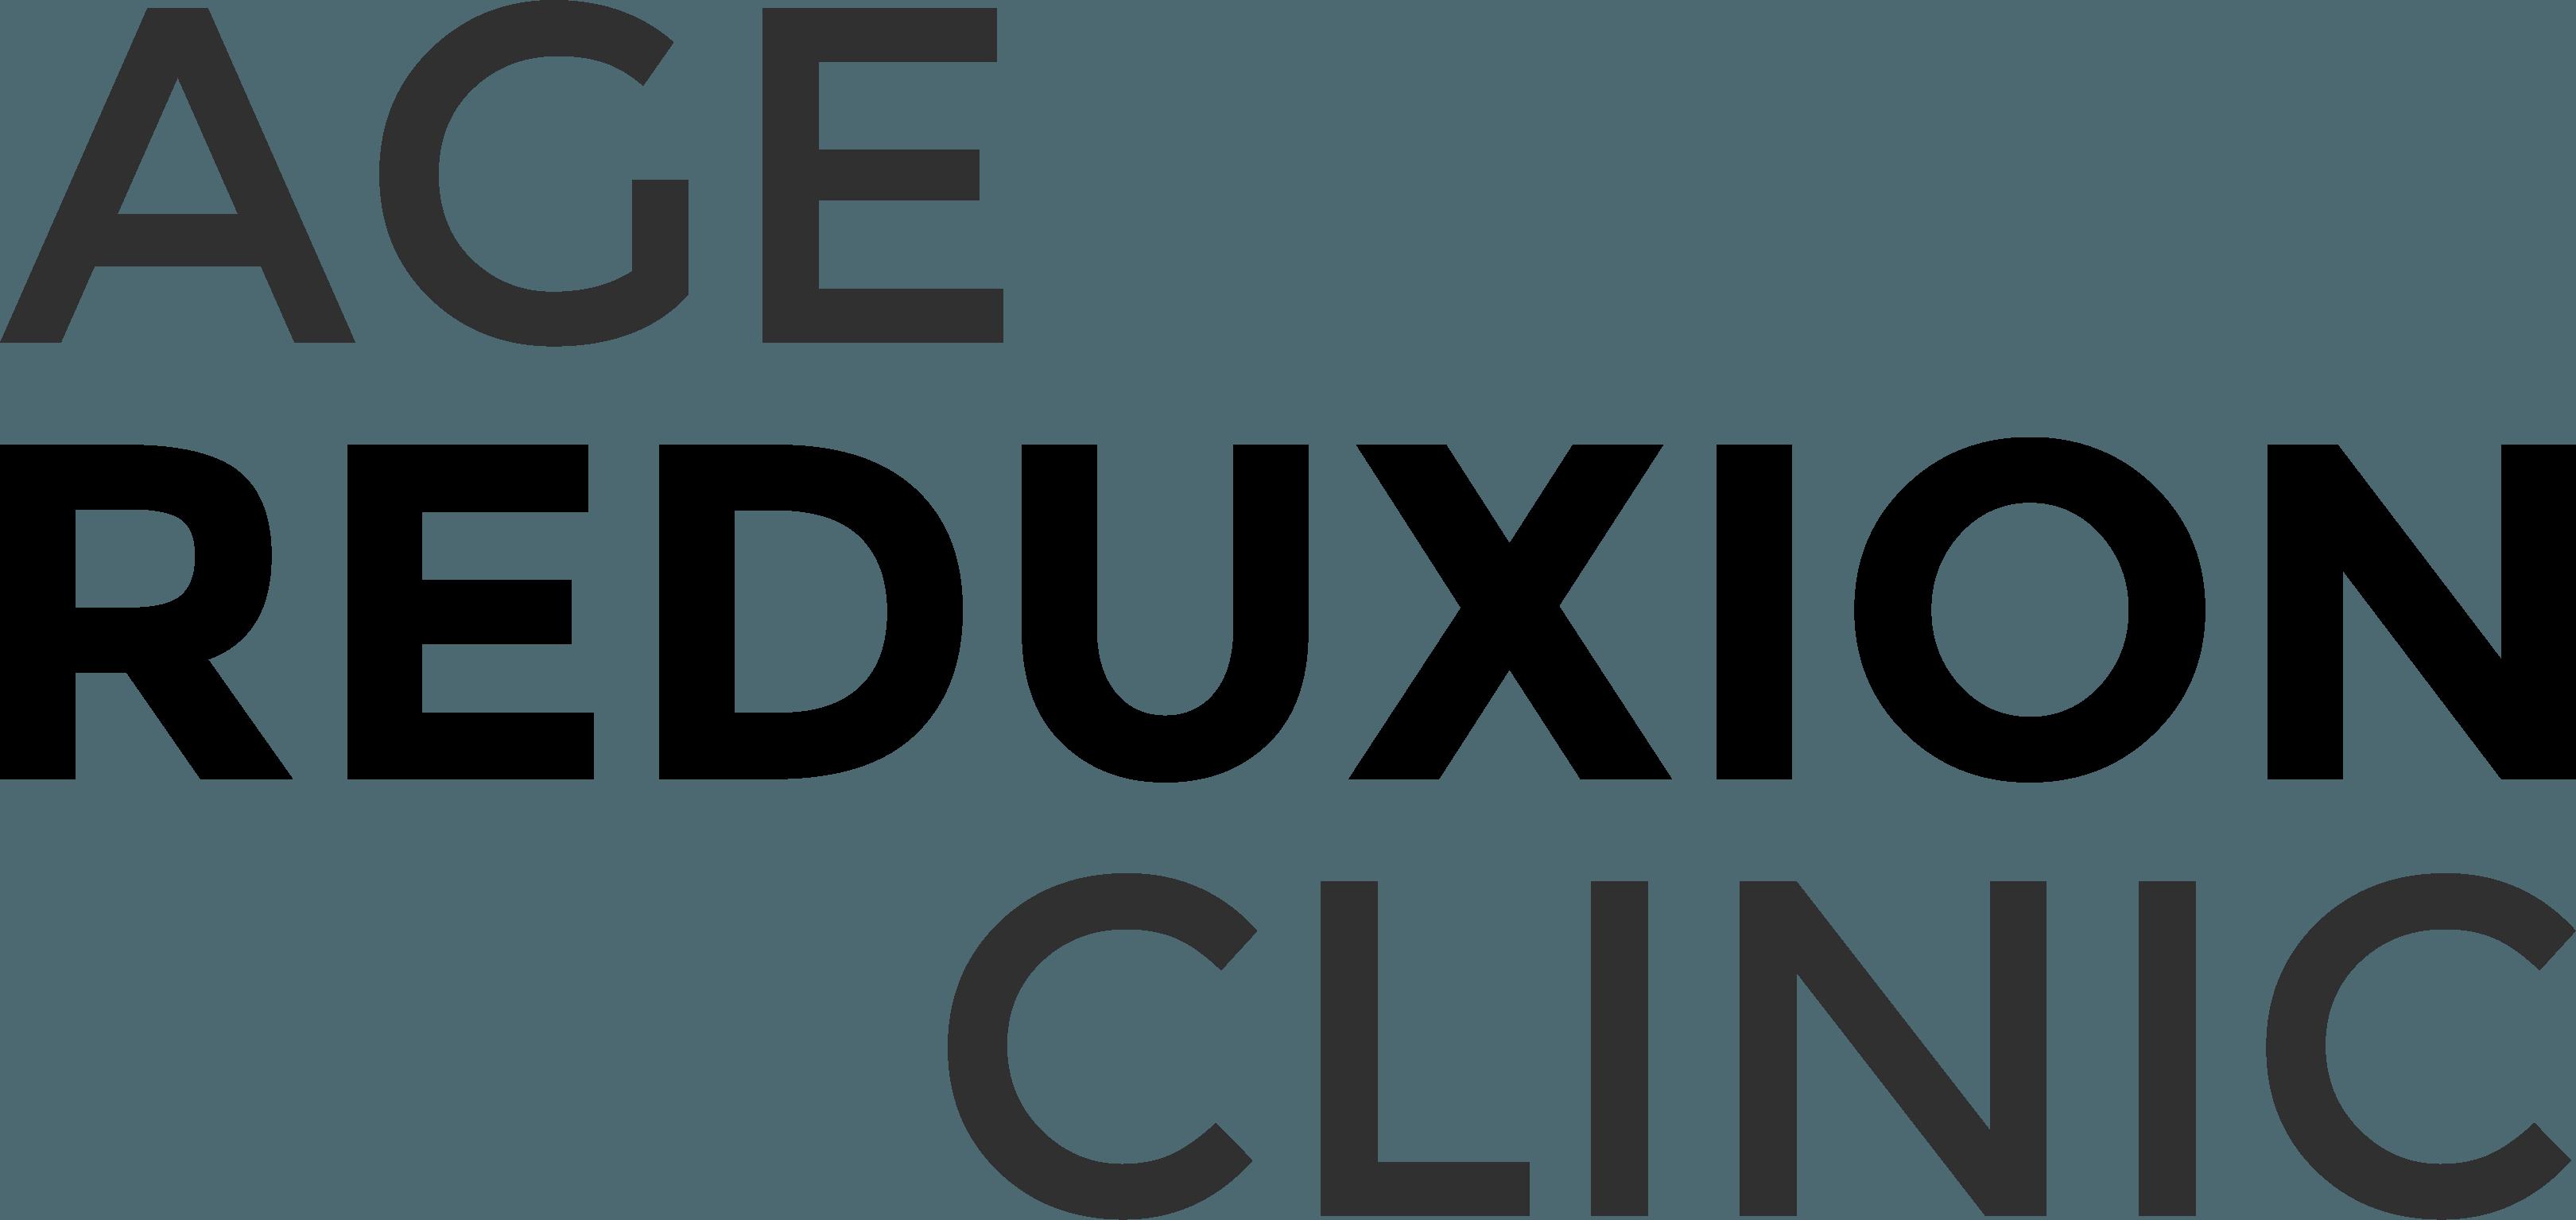 age reduxion clinic